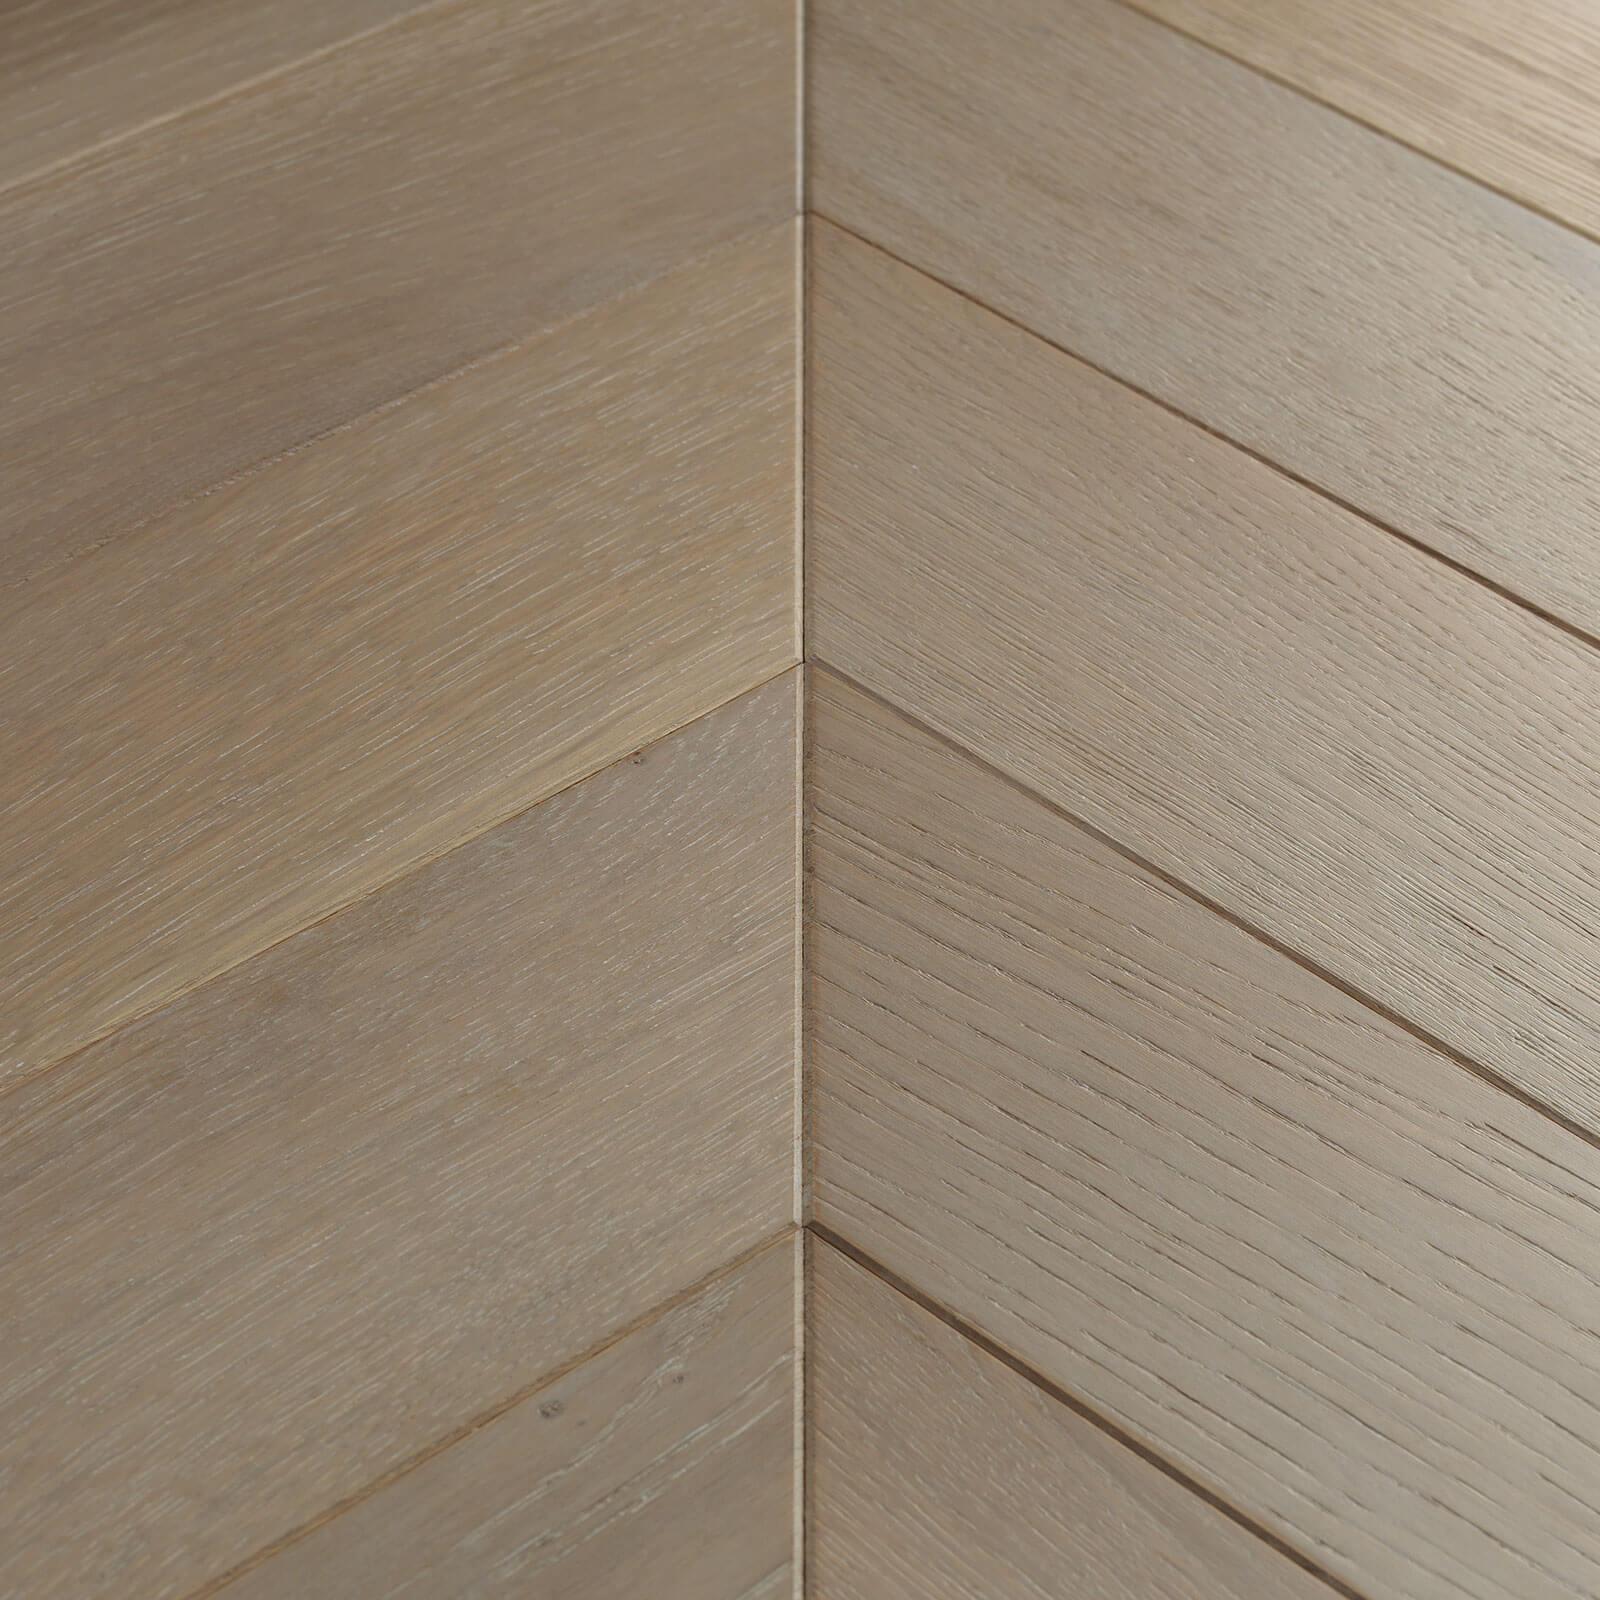 Haze Oak Goodrich Woodpecker Flooring